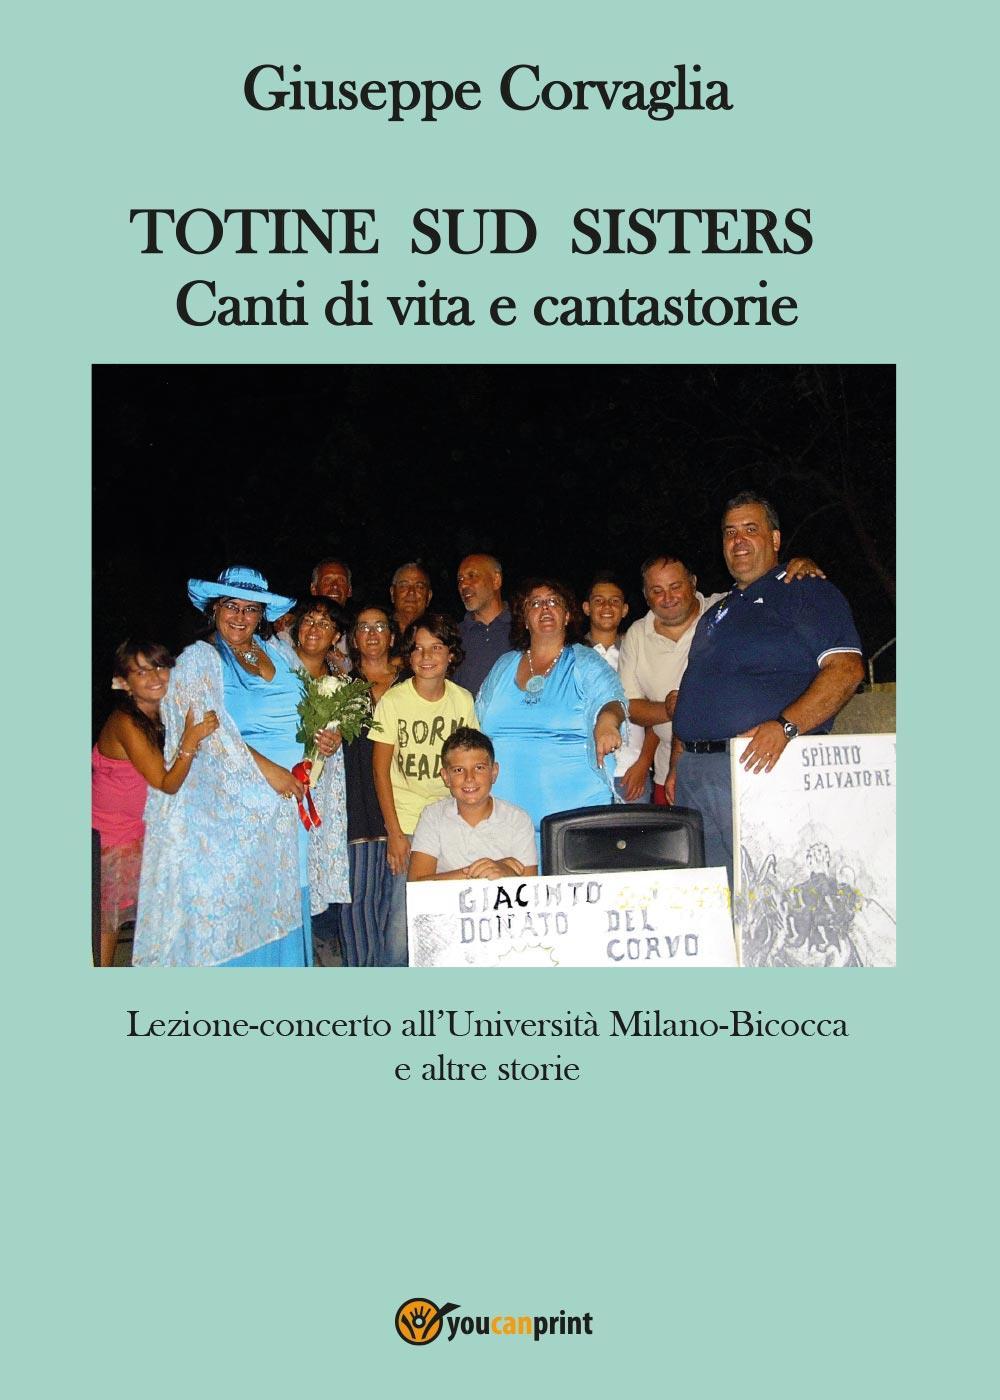 TOTINE SUD SISTERS - Canti di vita e cantastorie